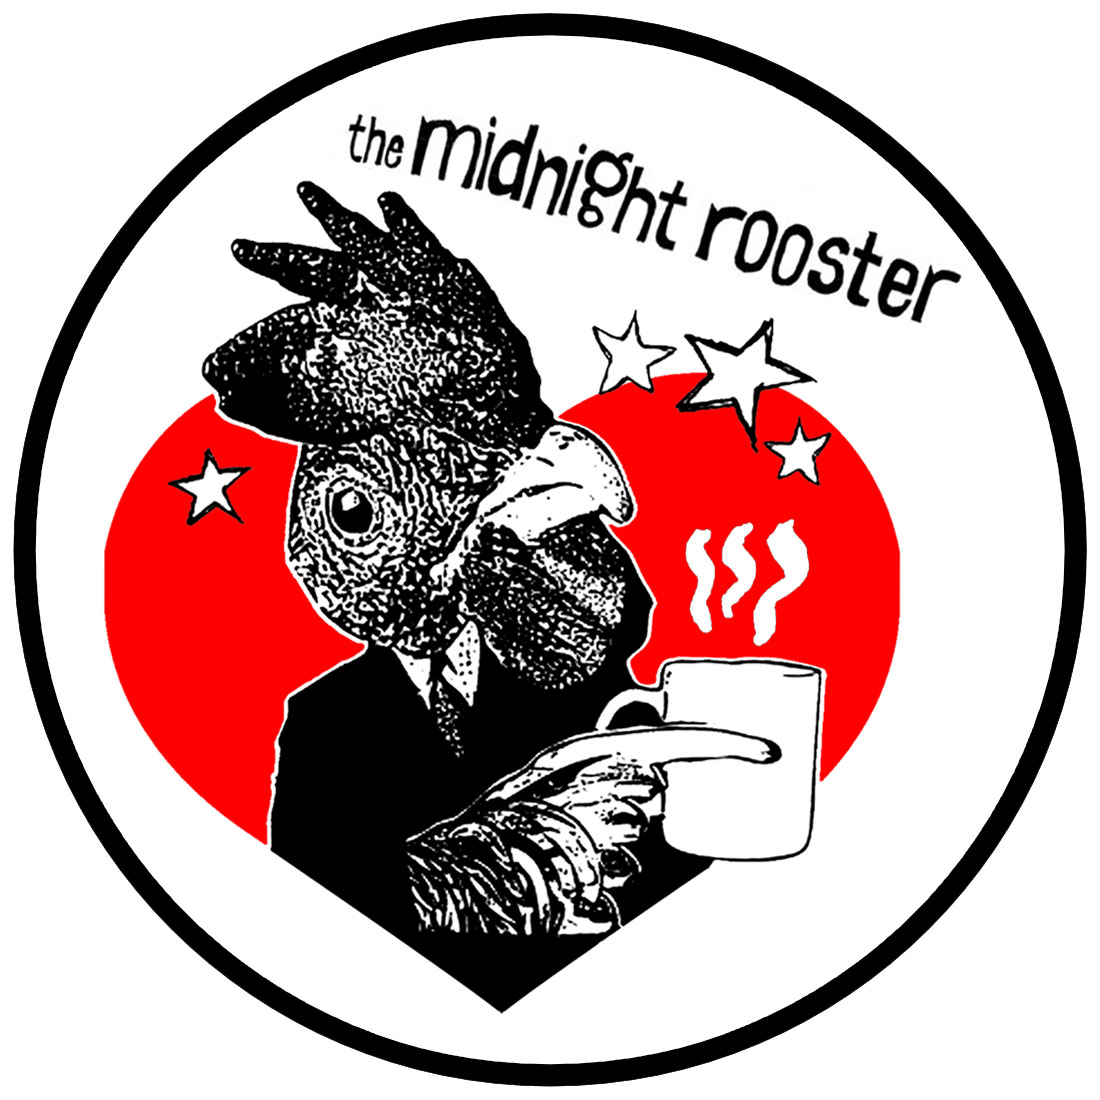 midnight-rooster_circleandnamesticker.jpg